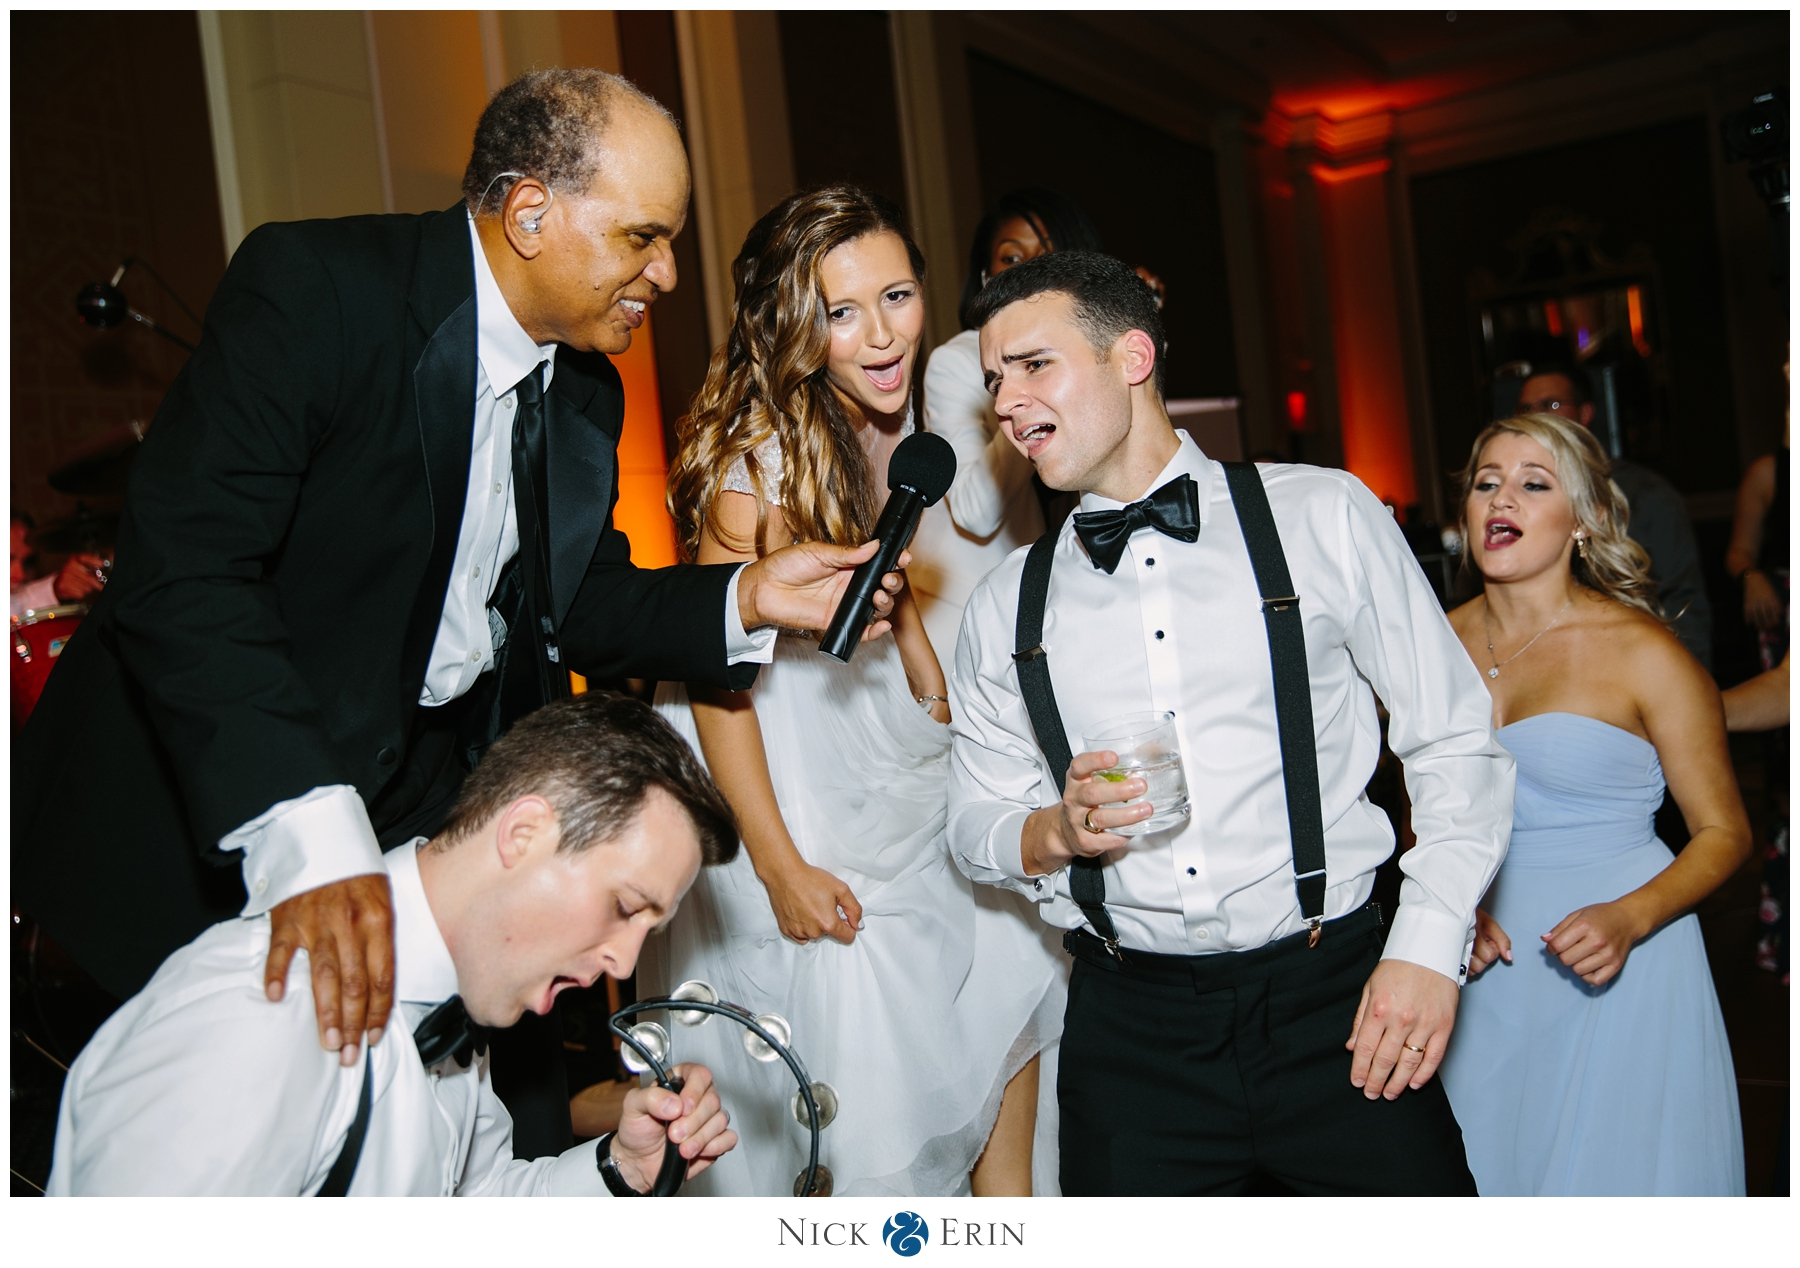 donner_photography_washington-dc-wedding_ariel-patrick_0088